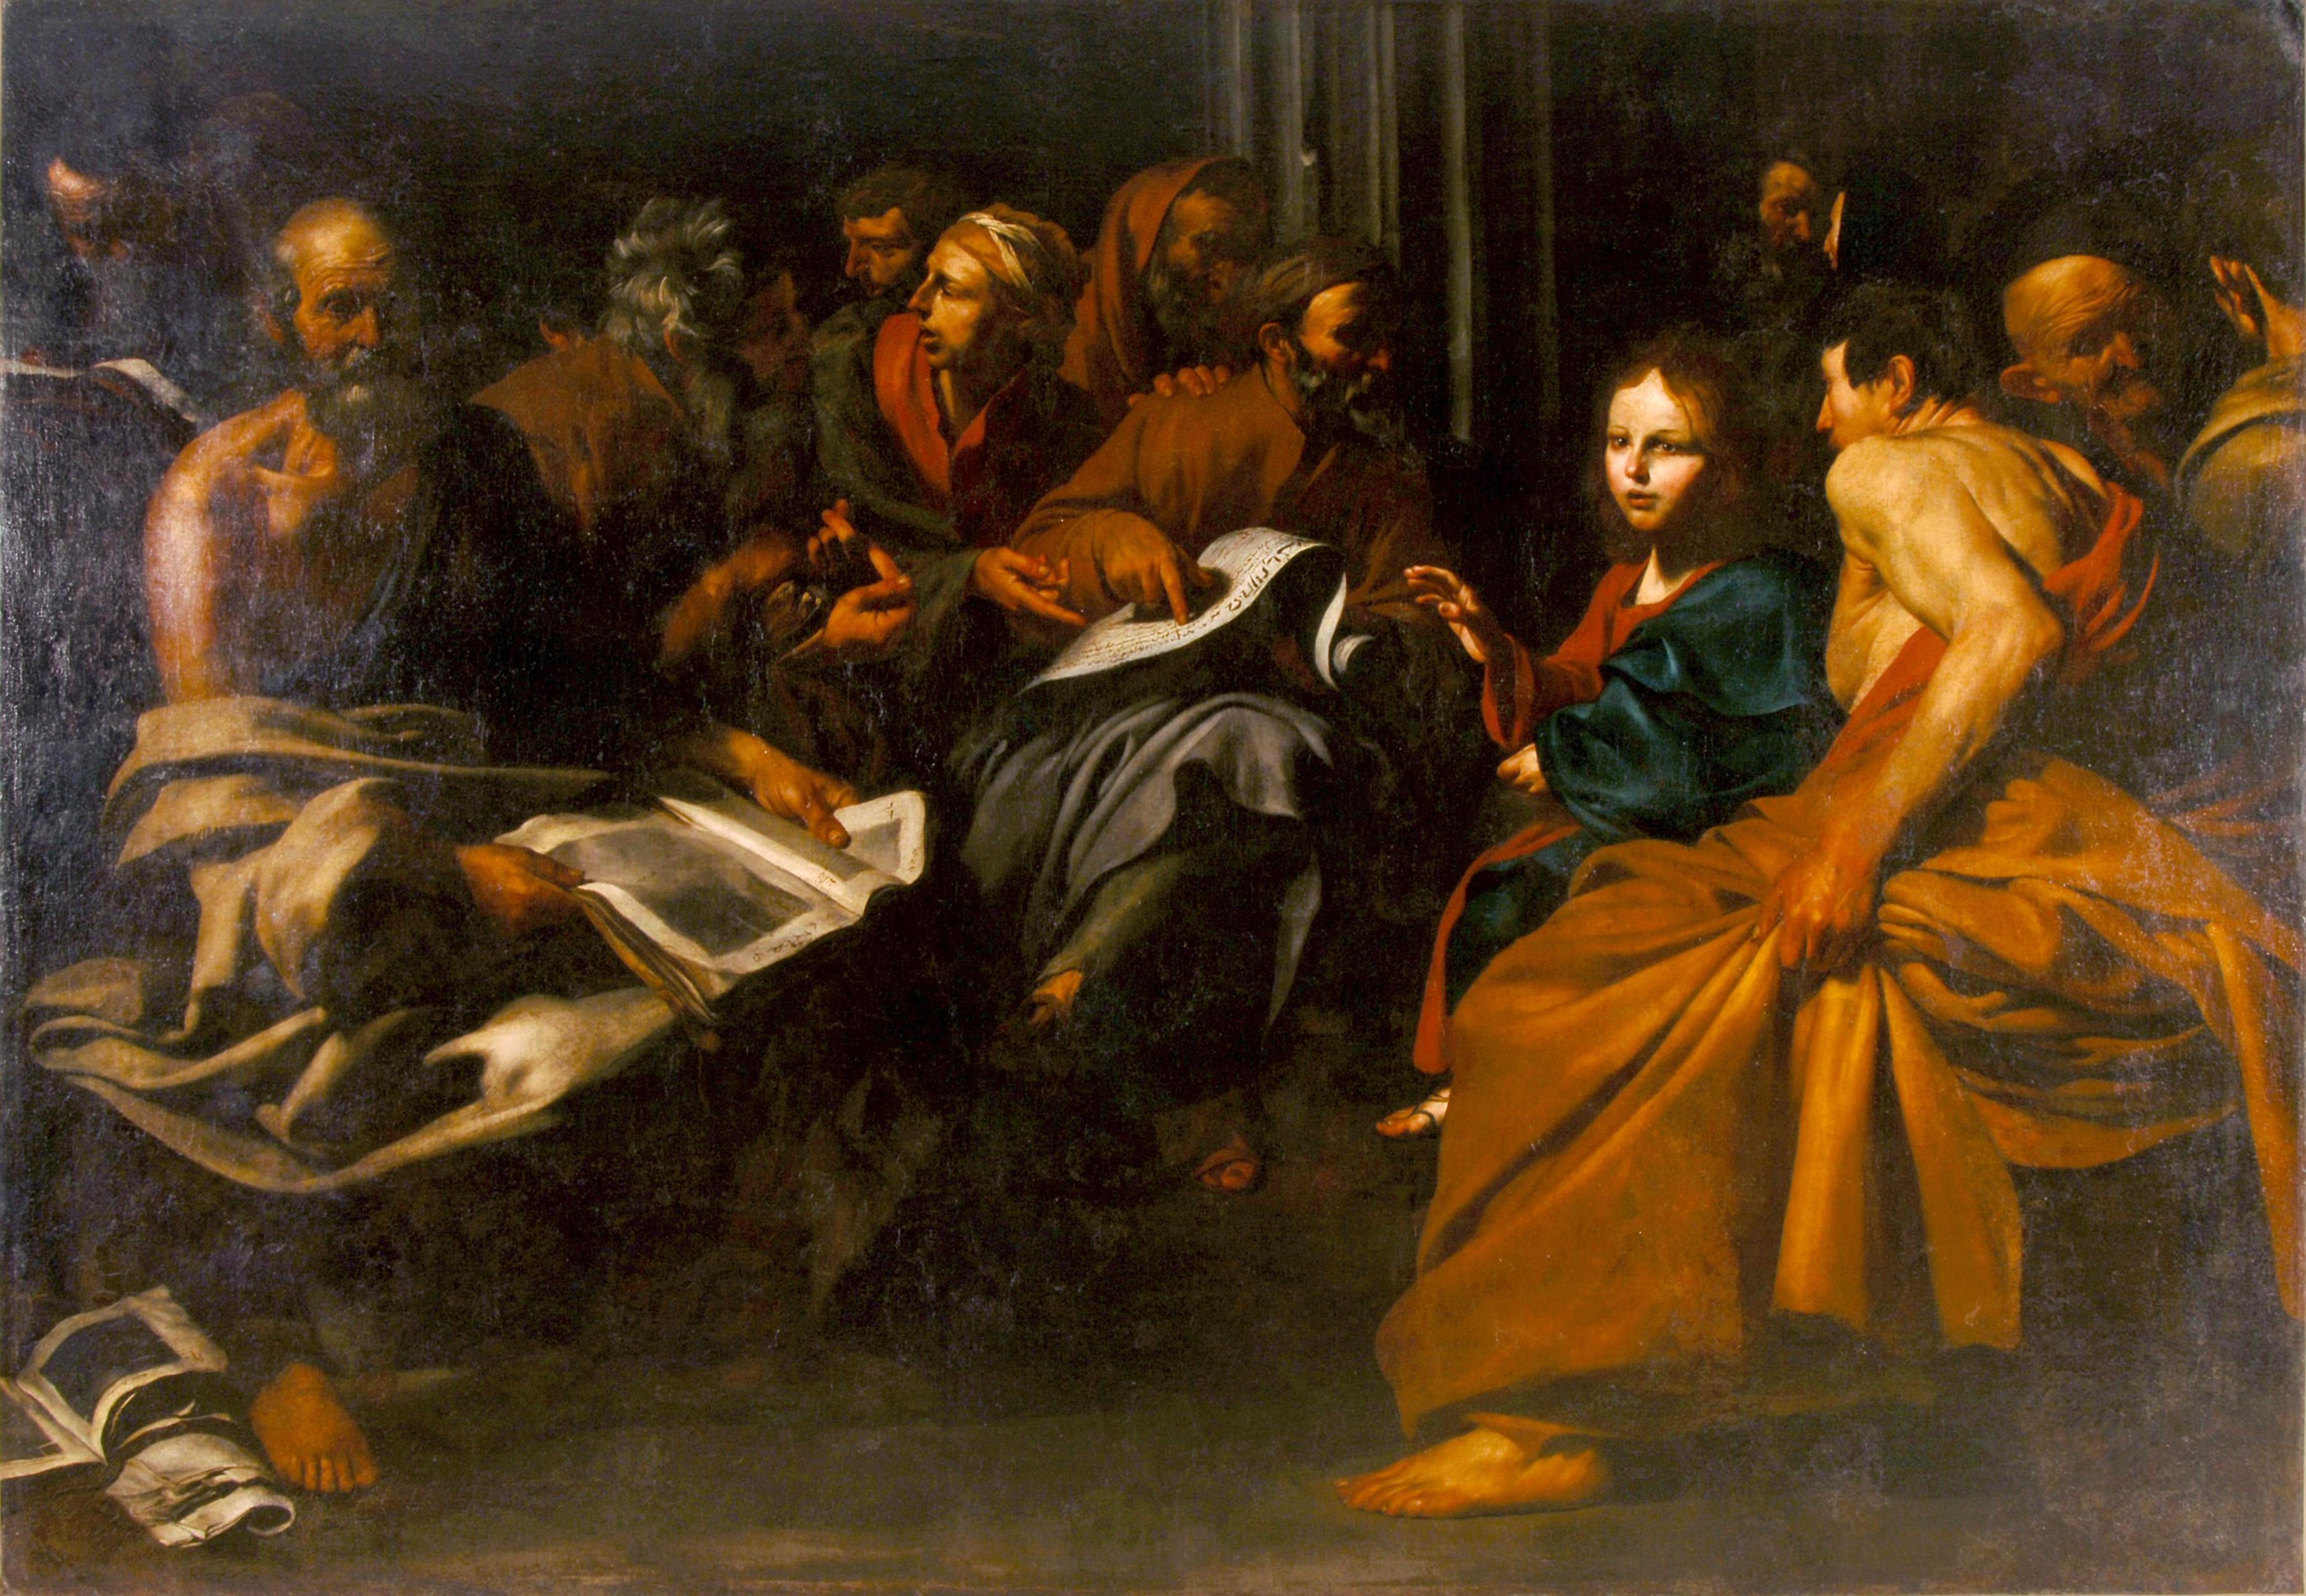 Description Of Jesus In The Bible